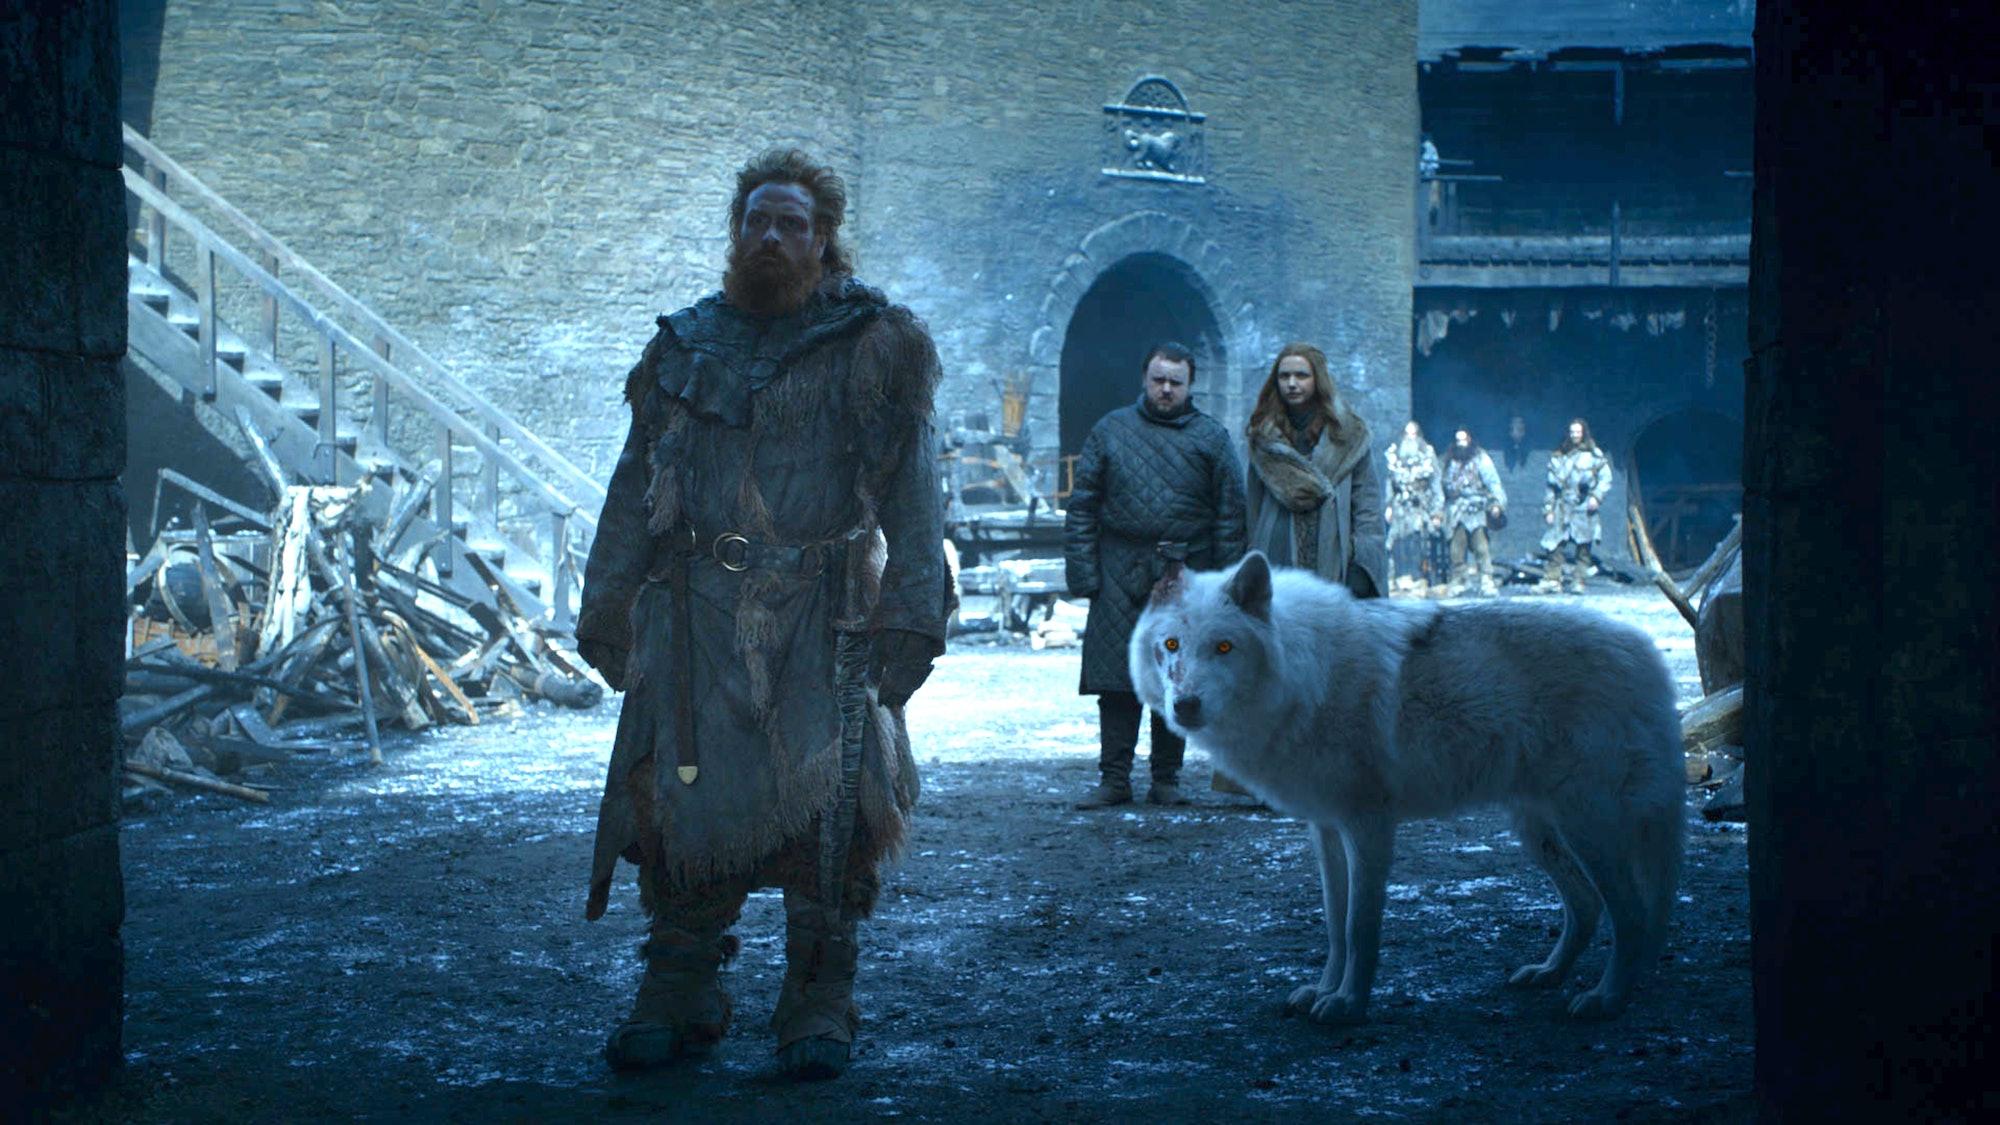 Game of Thrones Tormund Ghost